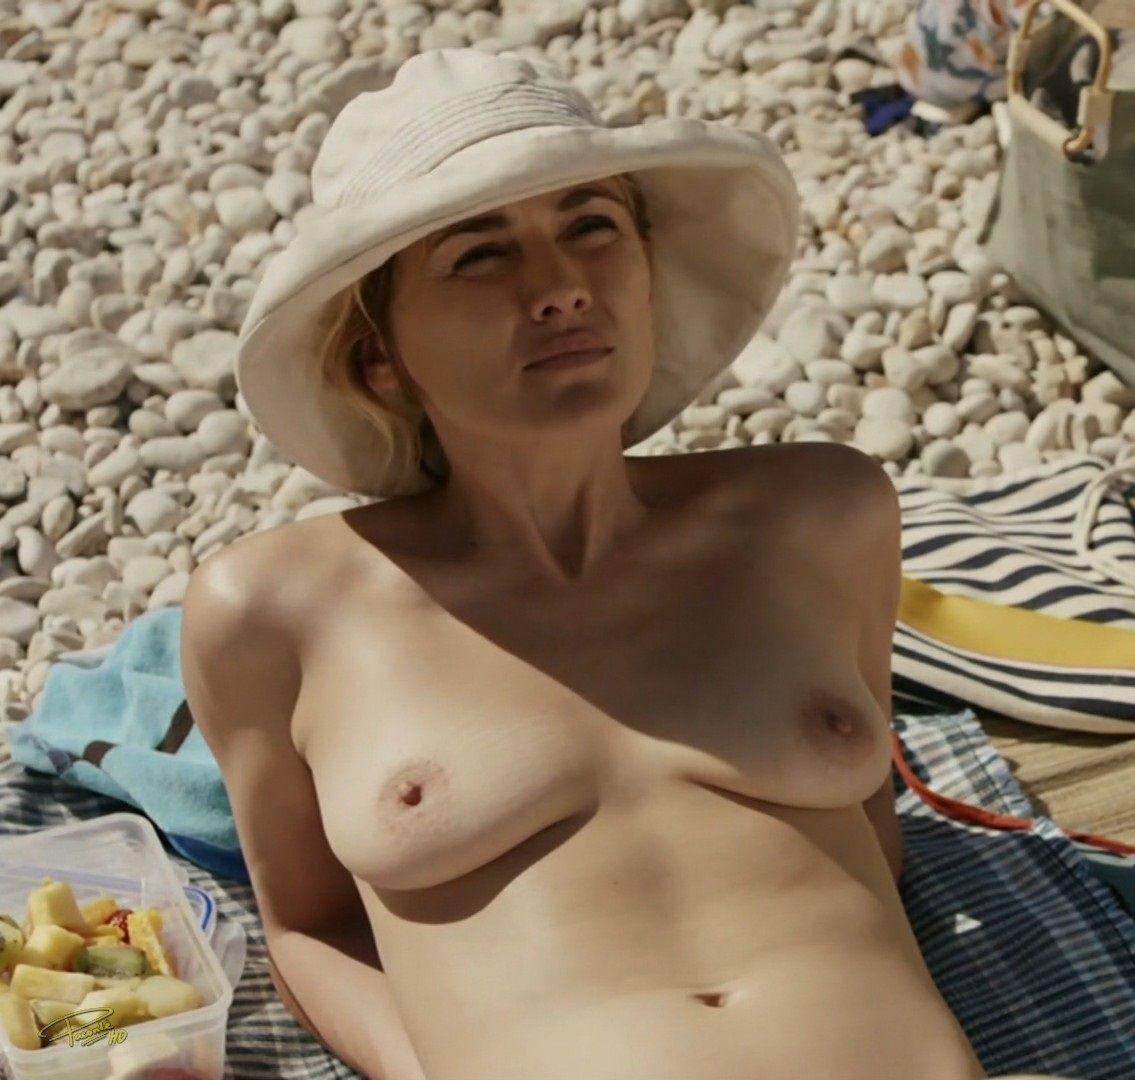 Andrea Duro Descuido marta nieto haciendo topless en la serie vergüenza |